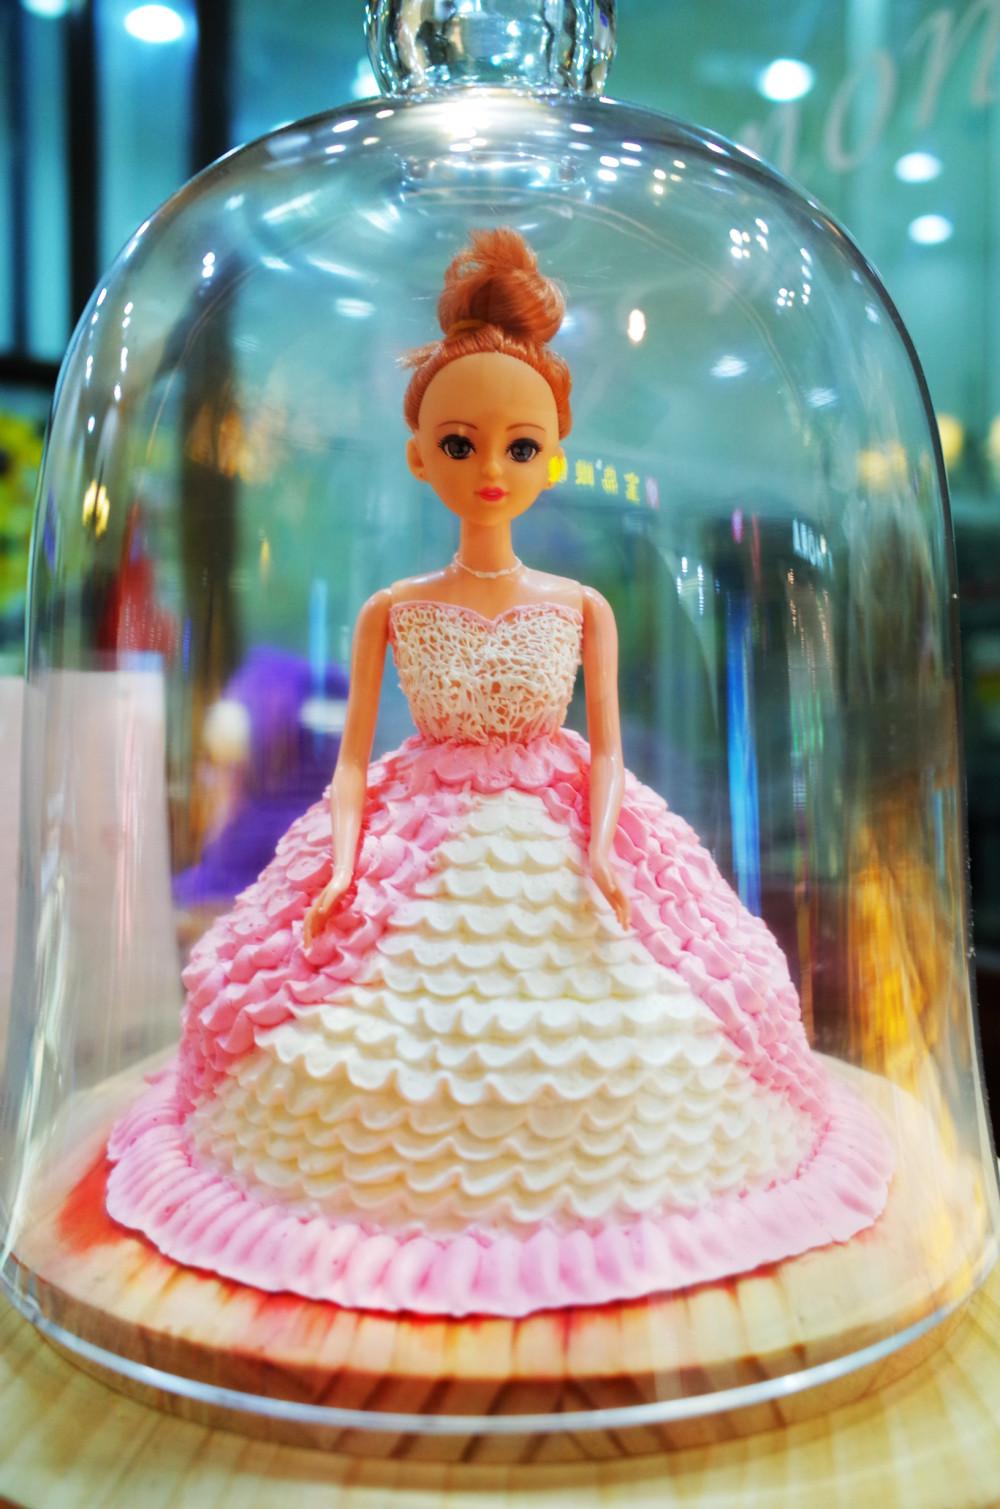 Doll cake @ CapitaMall, Beijing